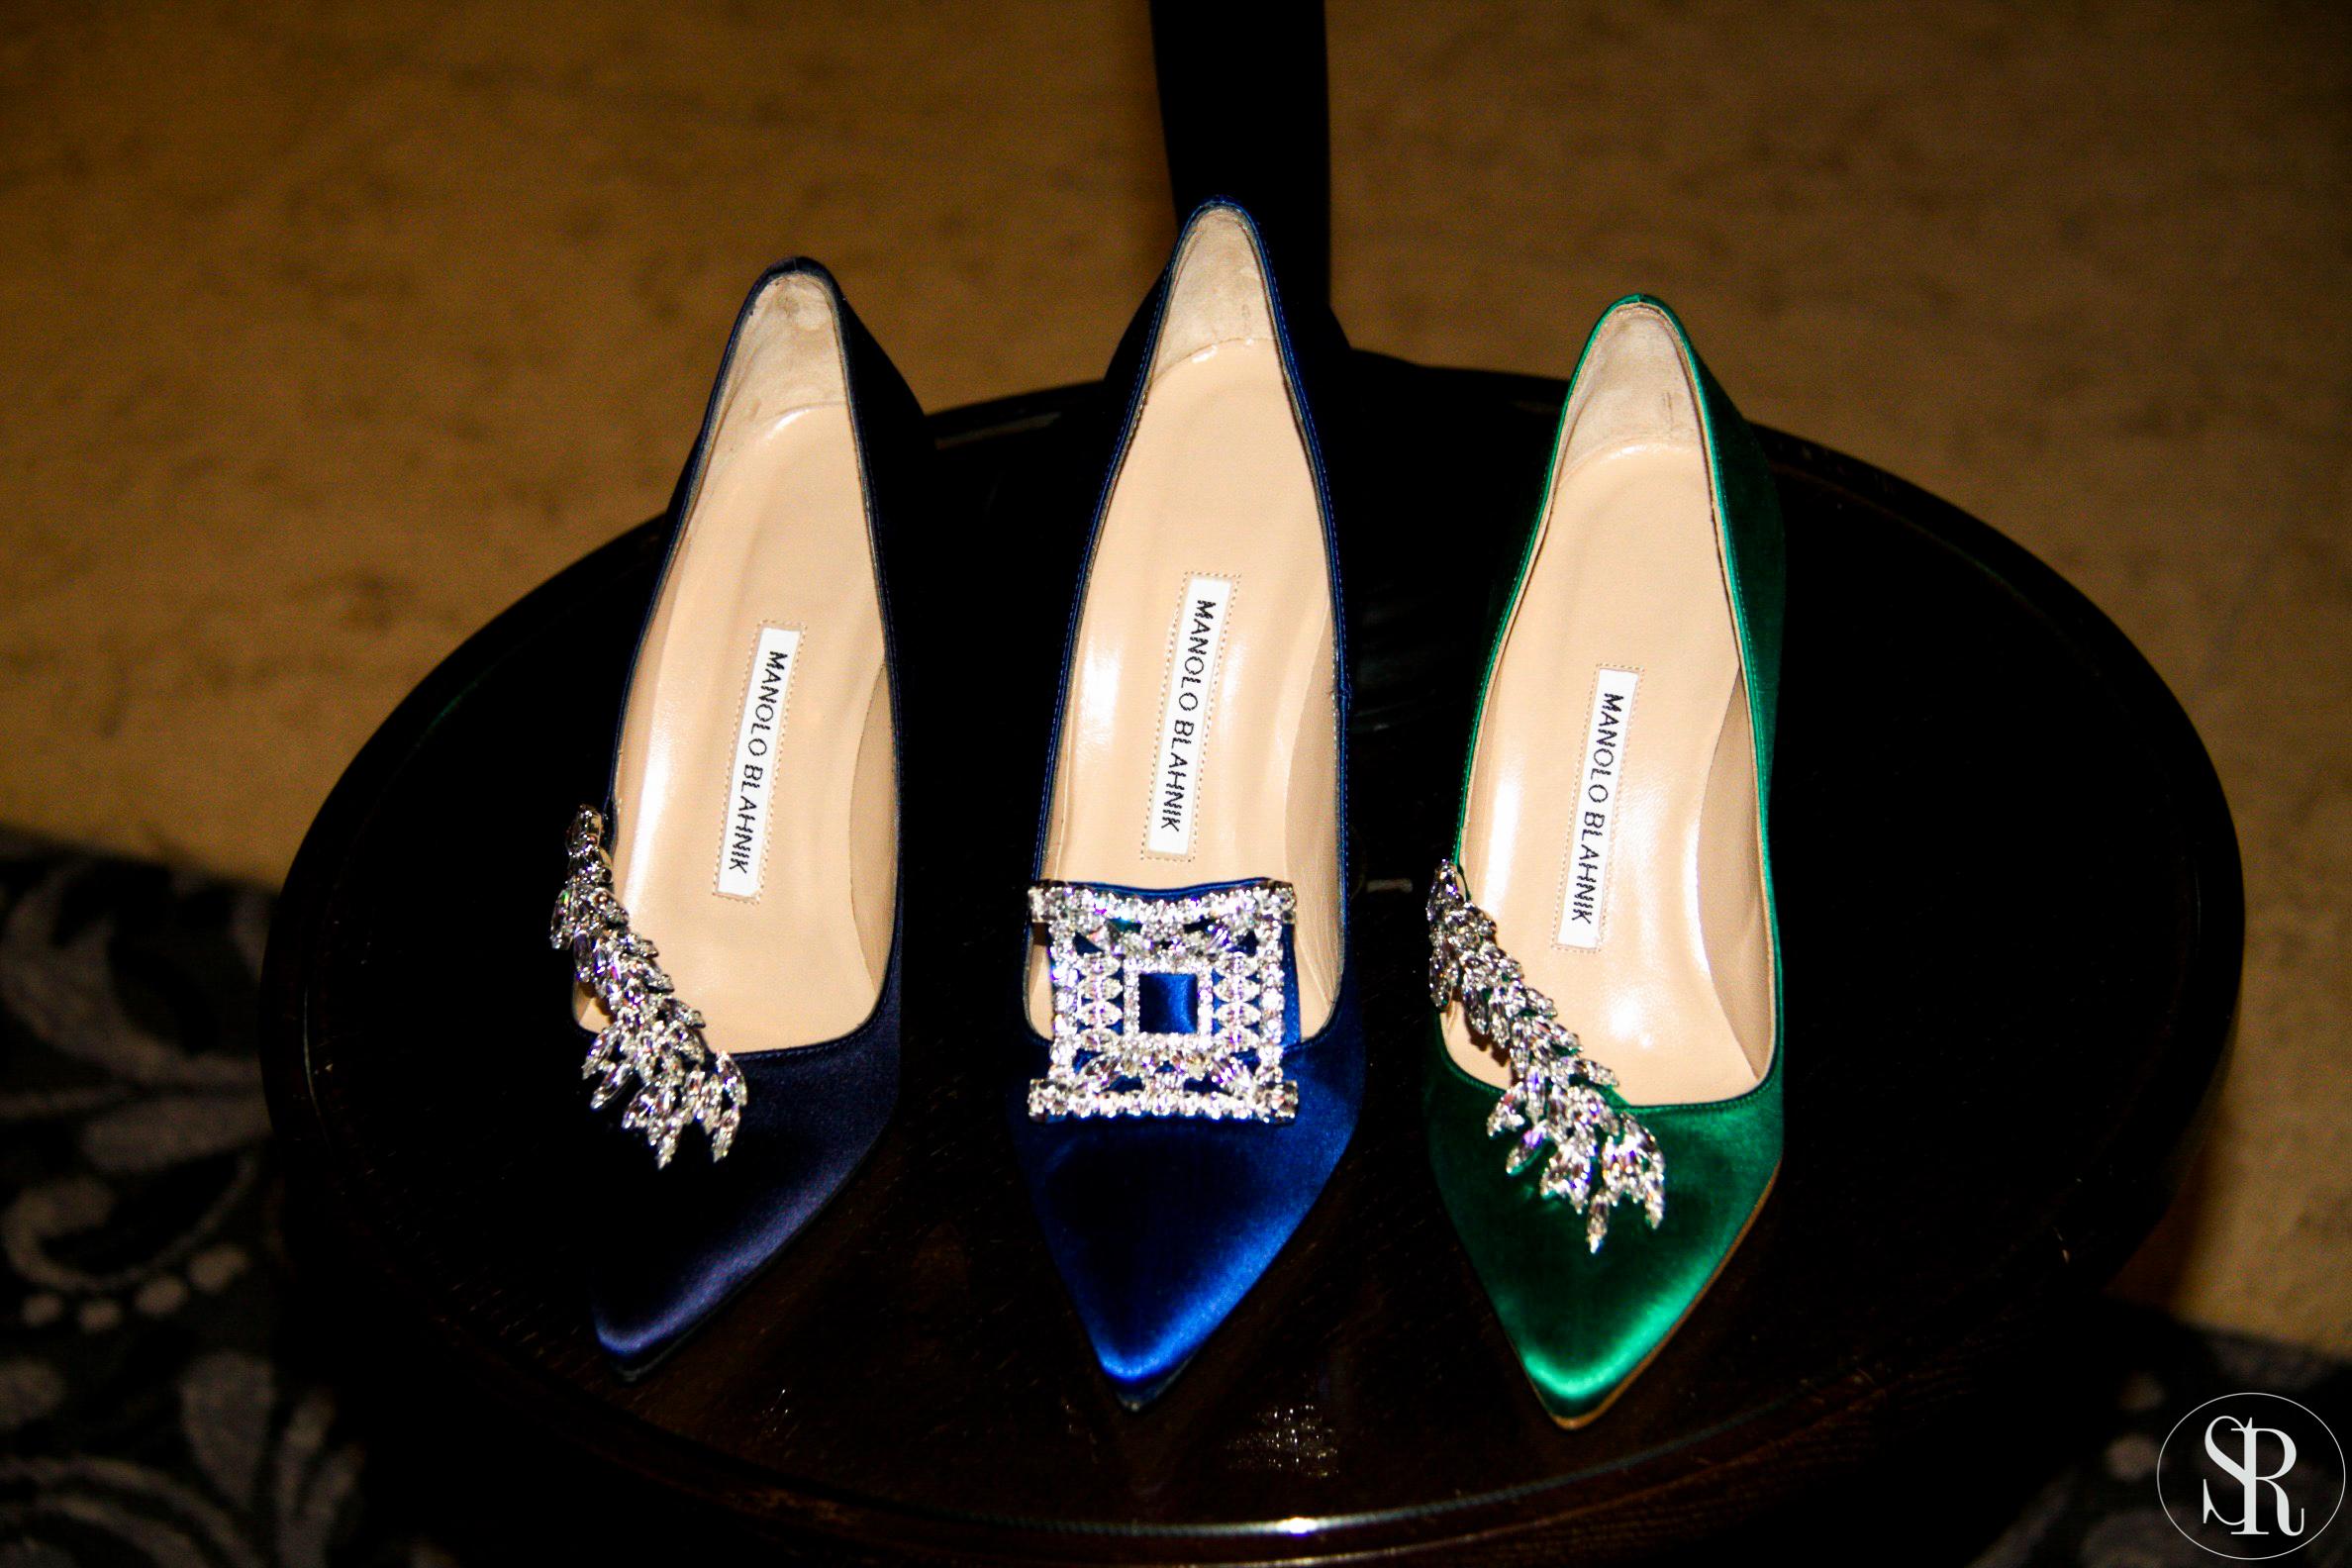 VIP launch of MANOLO BLAHNIK collection Fashion Afternoon Tea by Raffles Dubai-4021.jpg